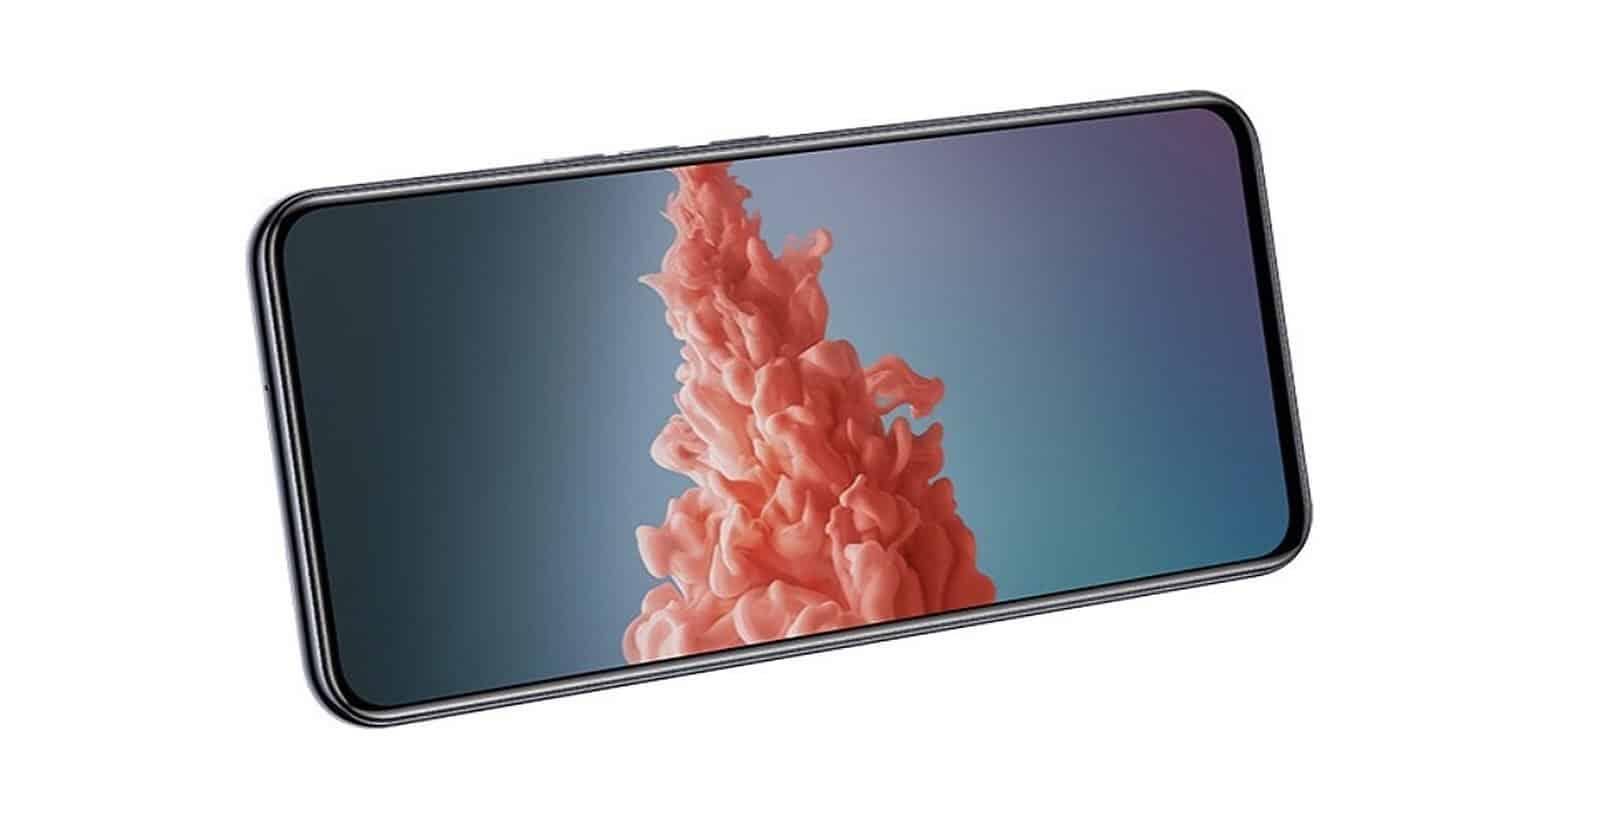 全球首部 屏 下 相機 ZTE Axon 20 5G 平 $ 2500 起 |  Unwire.hk |  الخط اليوم